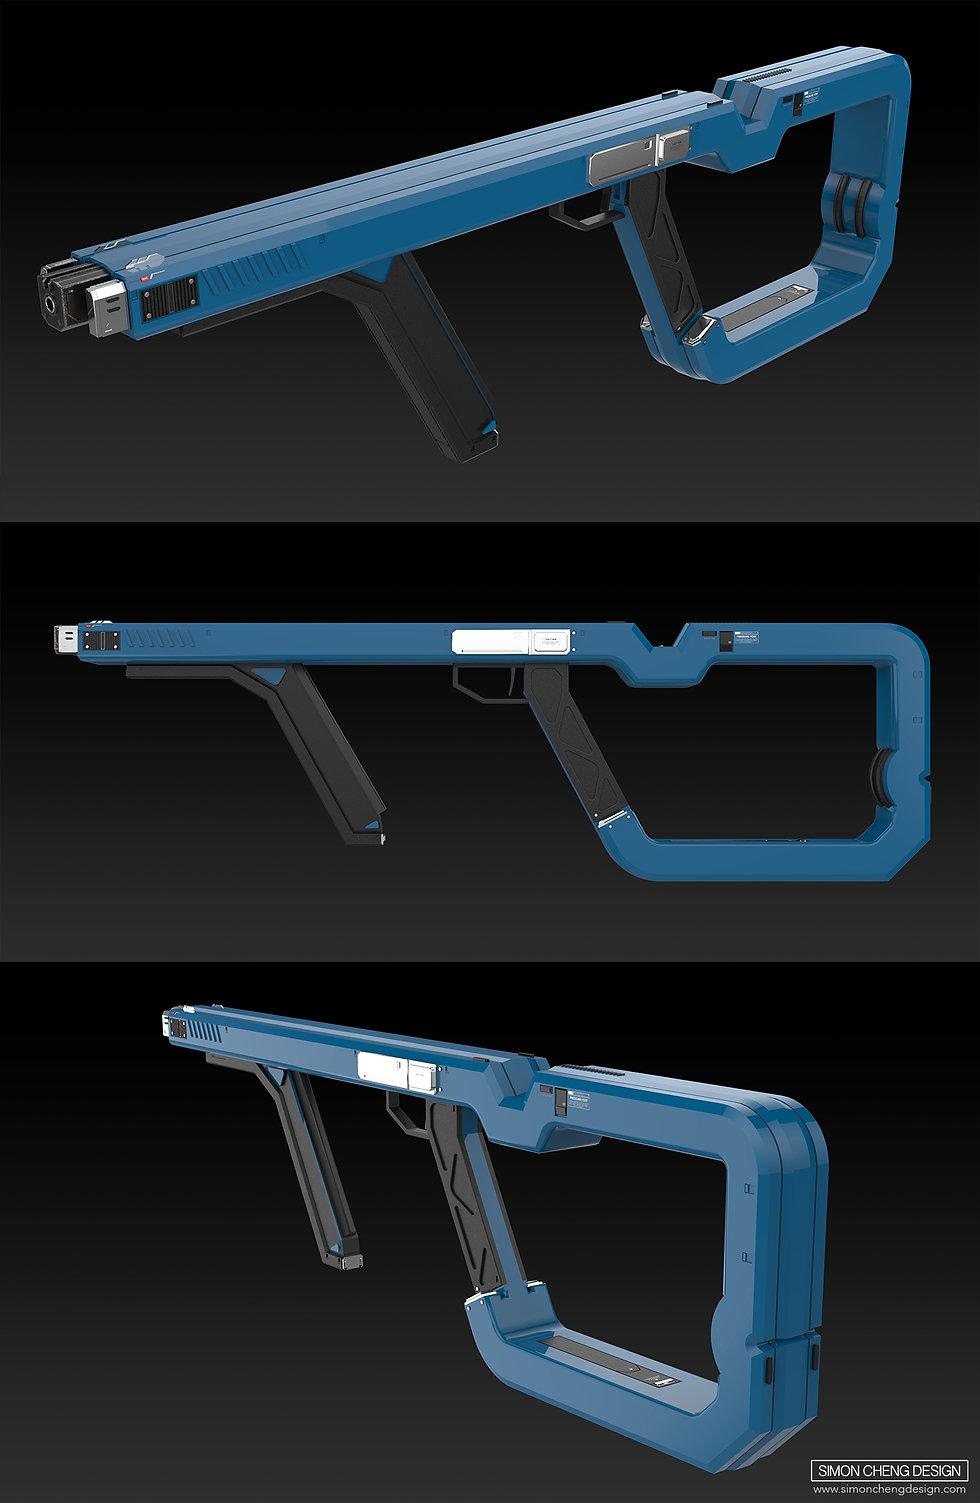 scd_weapon_032.jpg